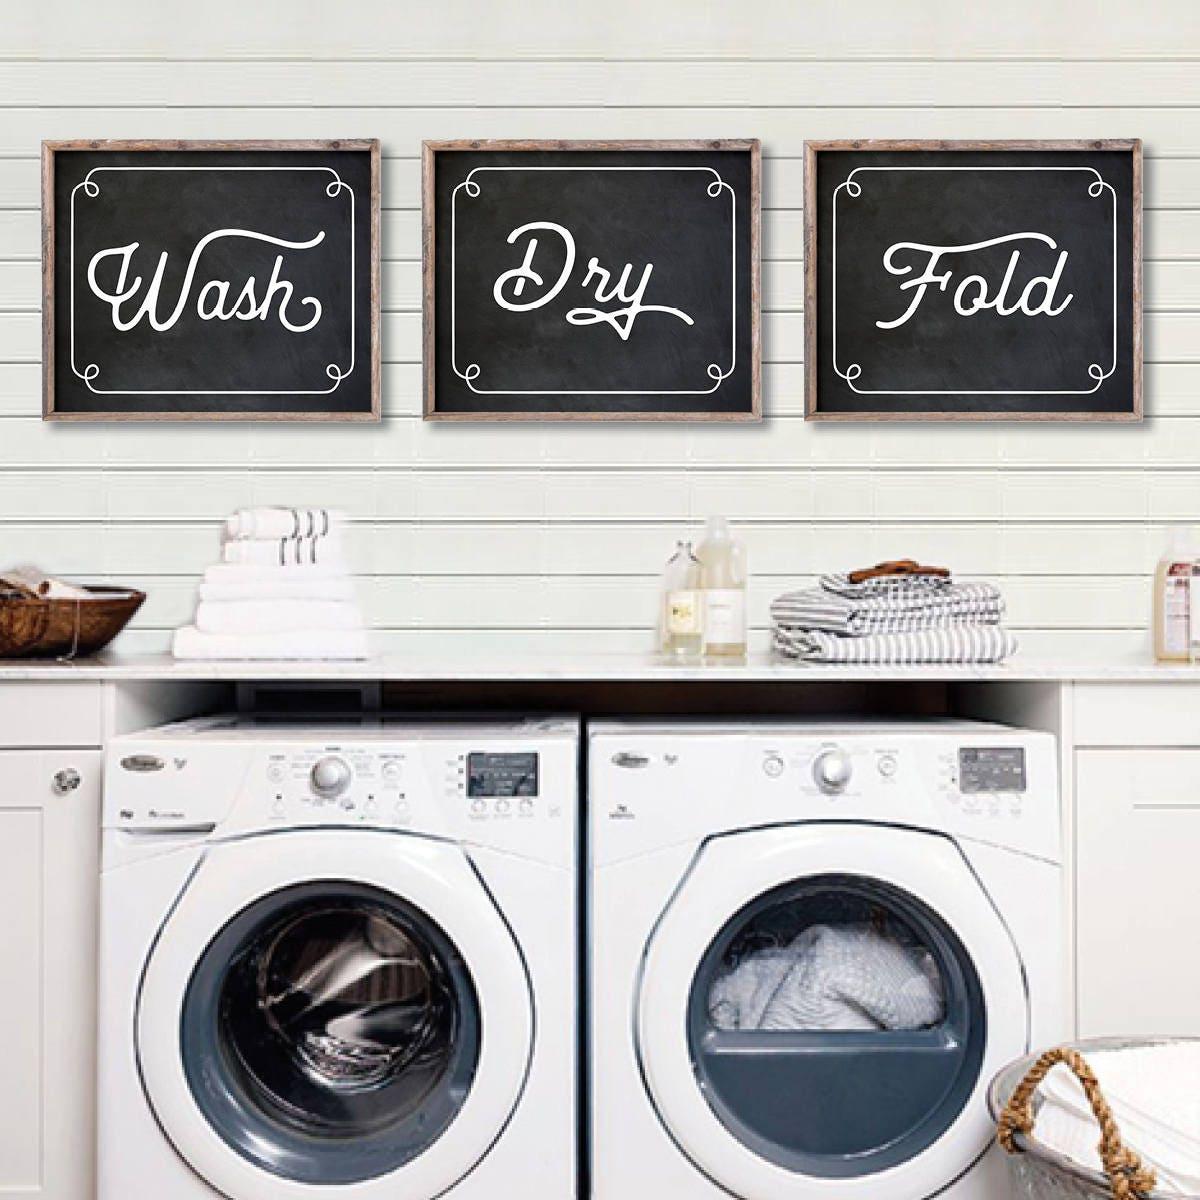 Laundry Room Decor. Laundry Room Sign - Laundry Room Decorations ...